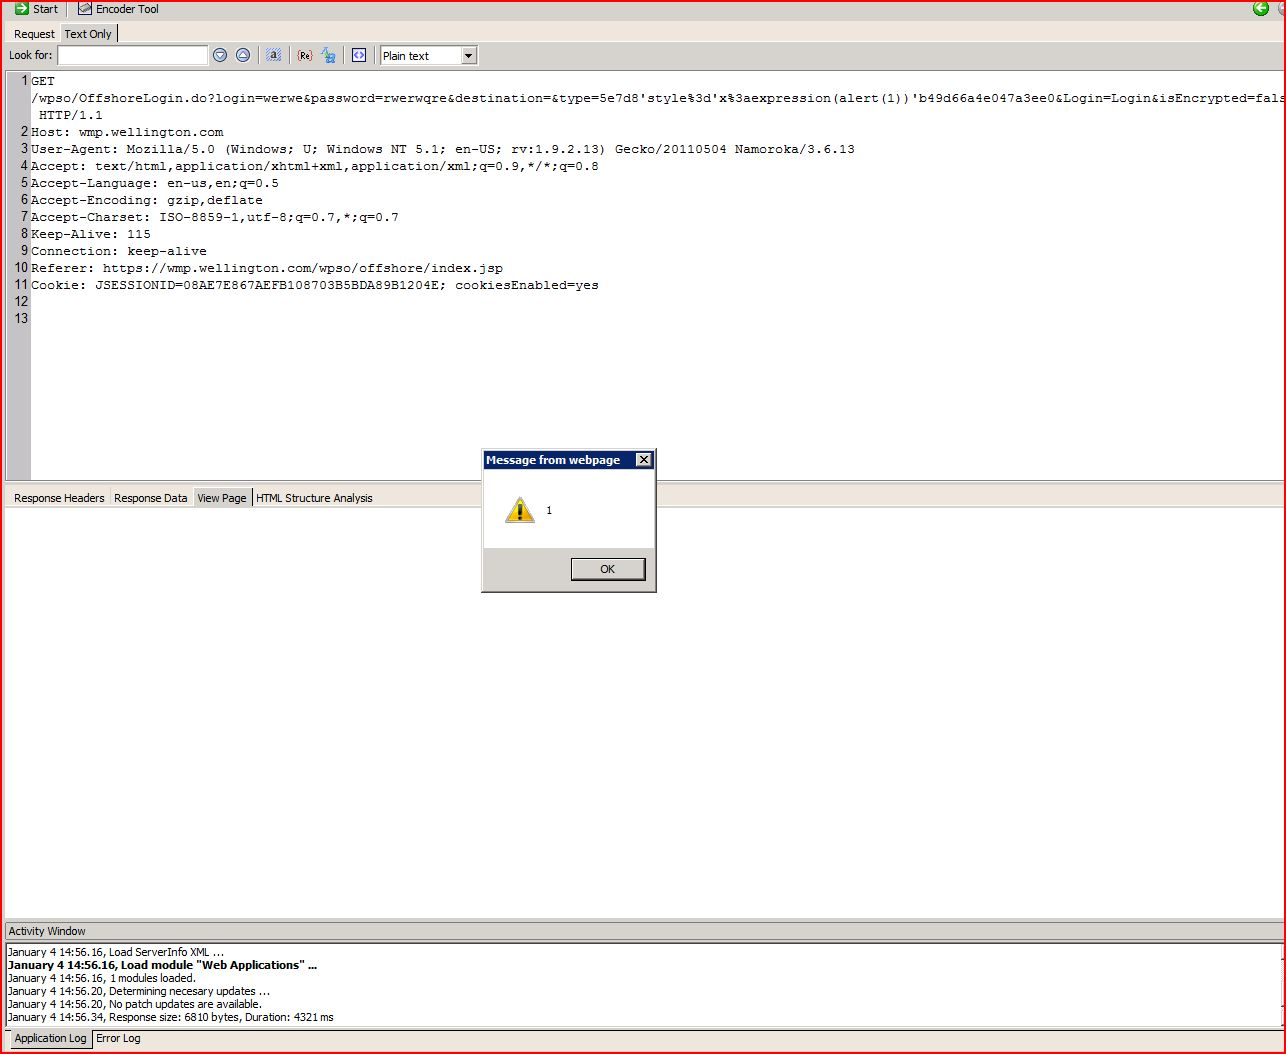 XSS in wmp.wellington.com, XSS, DORK, GHDB, Cross Site Scripting, CWE-79, CAPEC-86